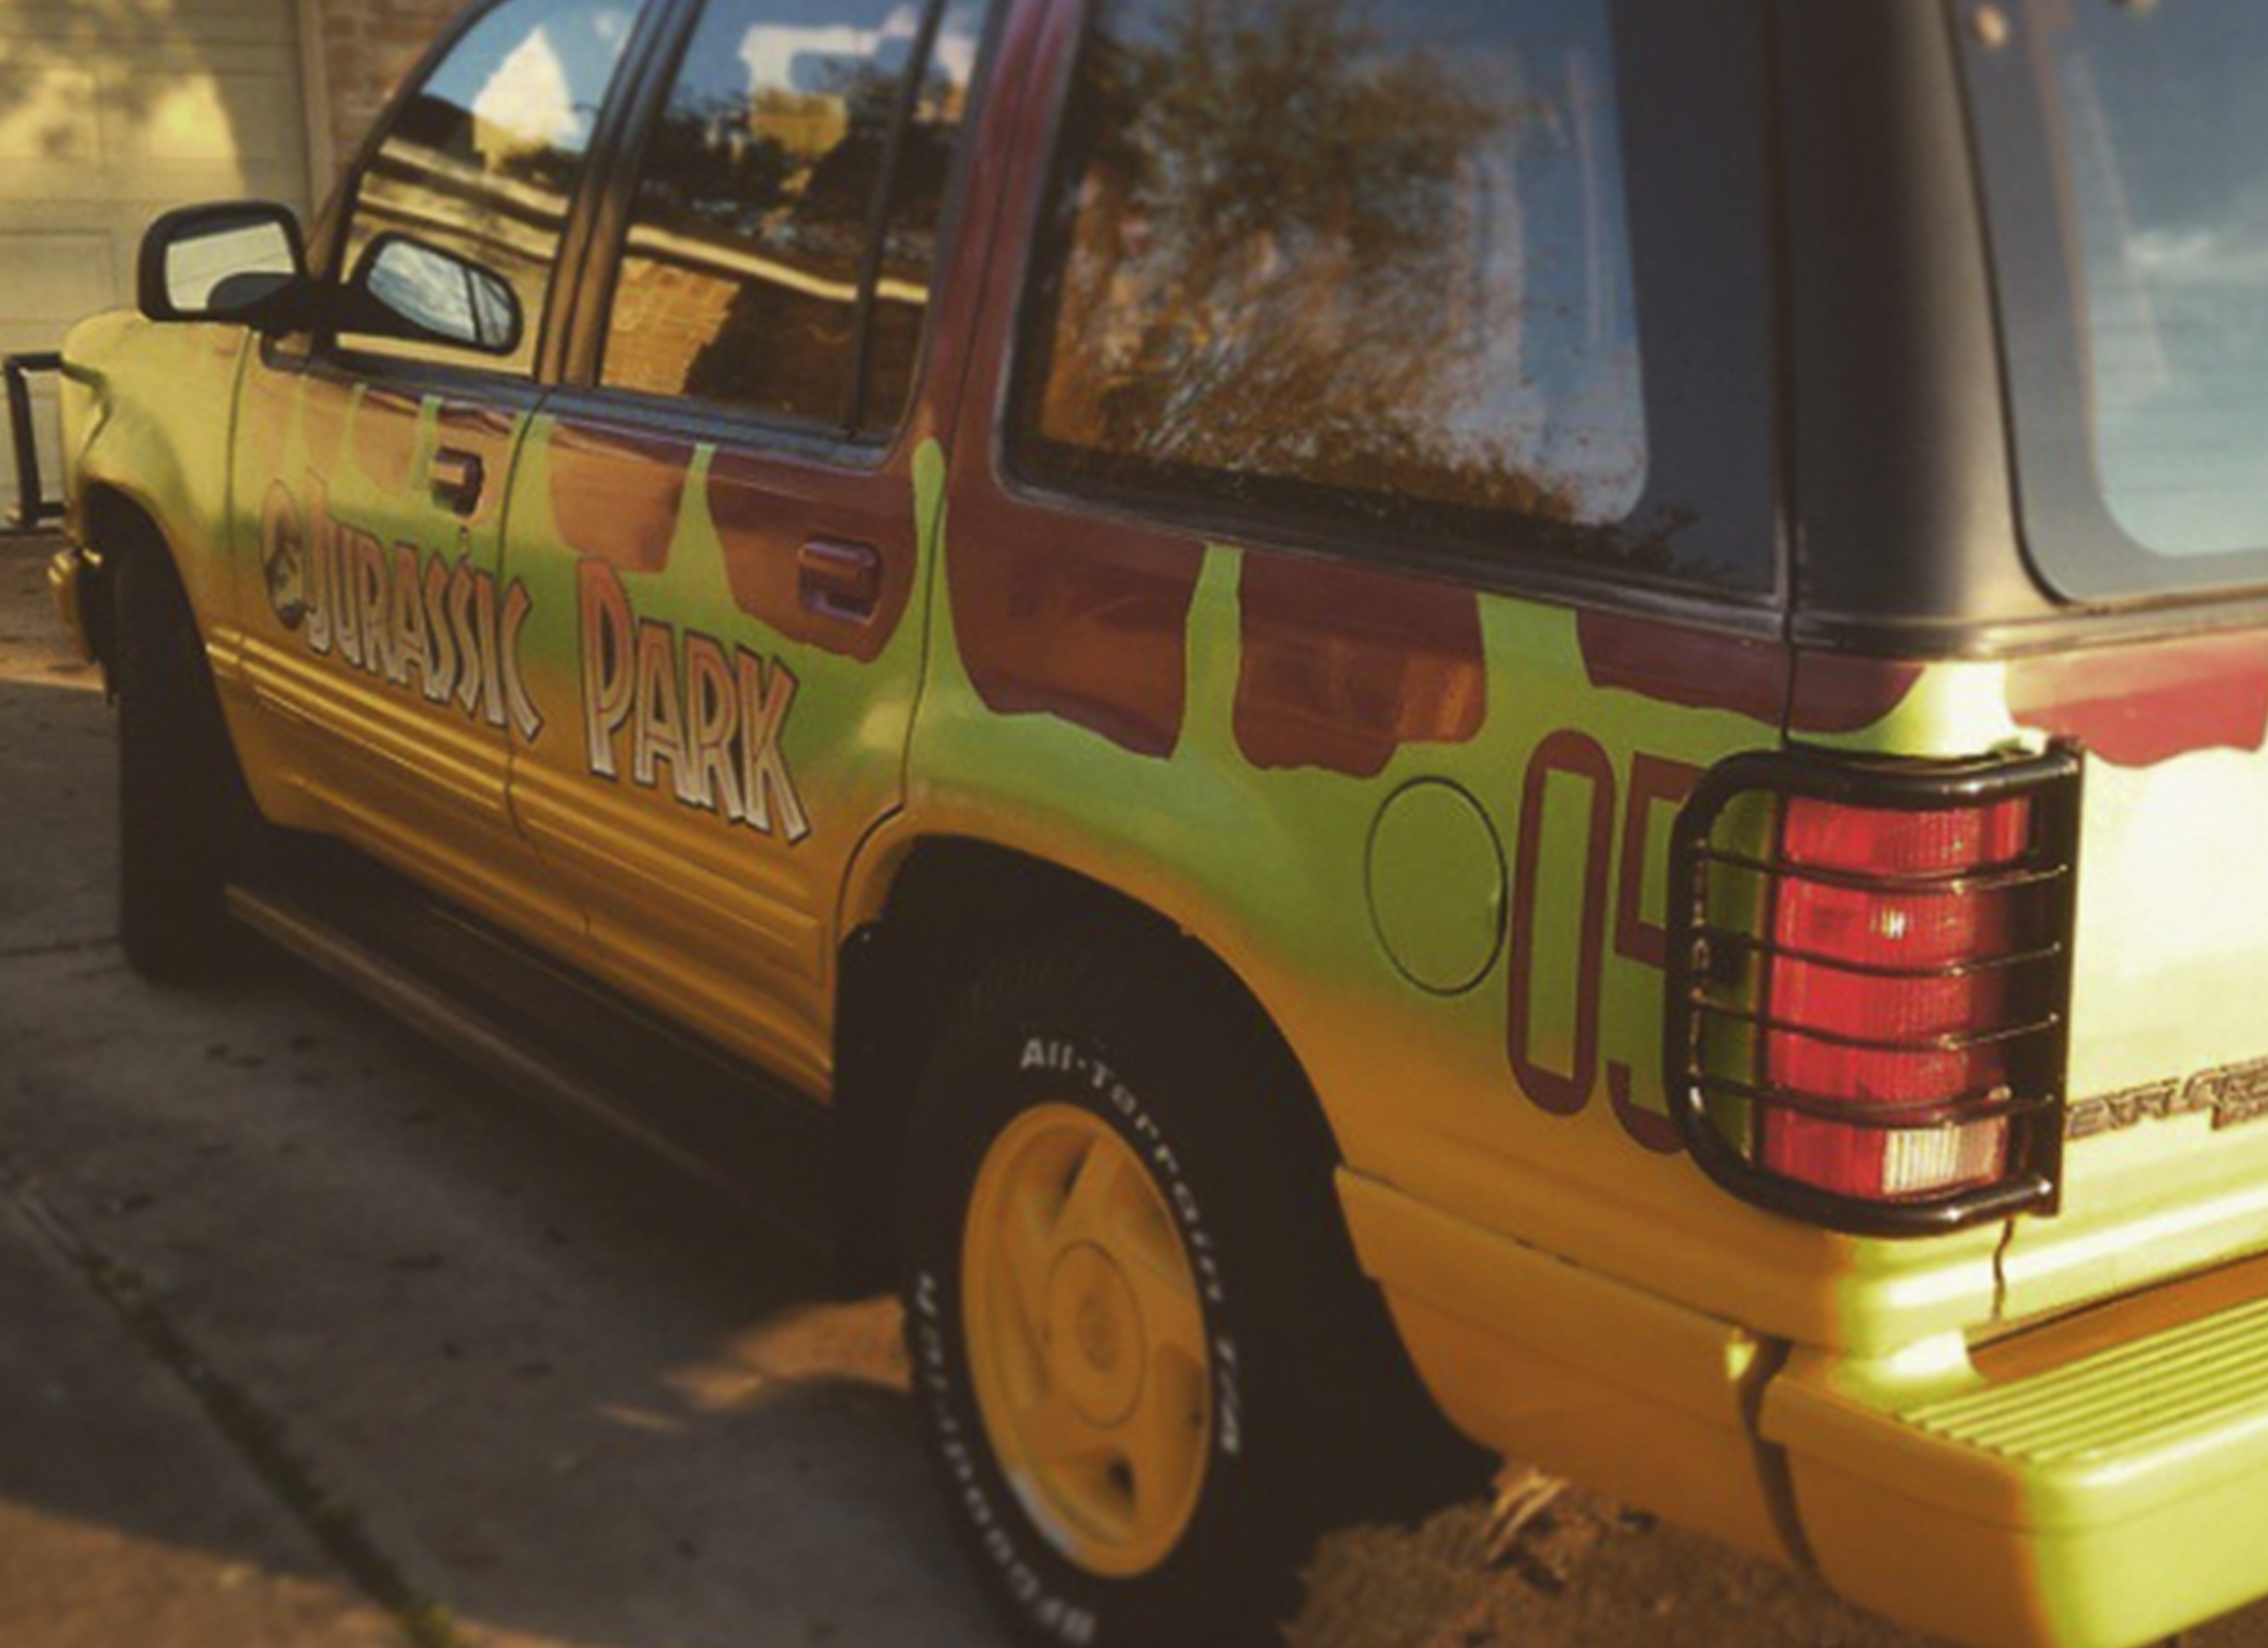 Reference Ford Explorer Guide Jurassic Park Motor Pool